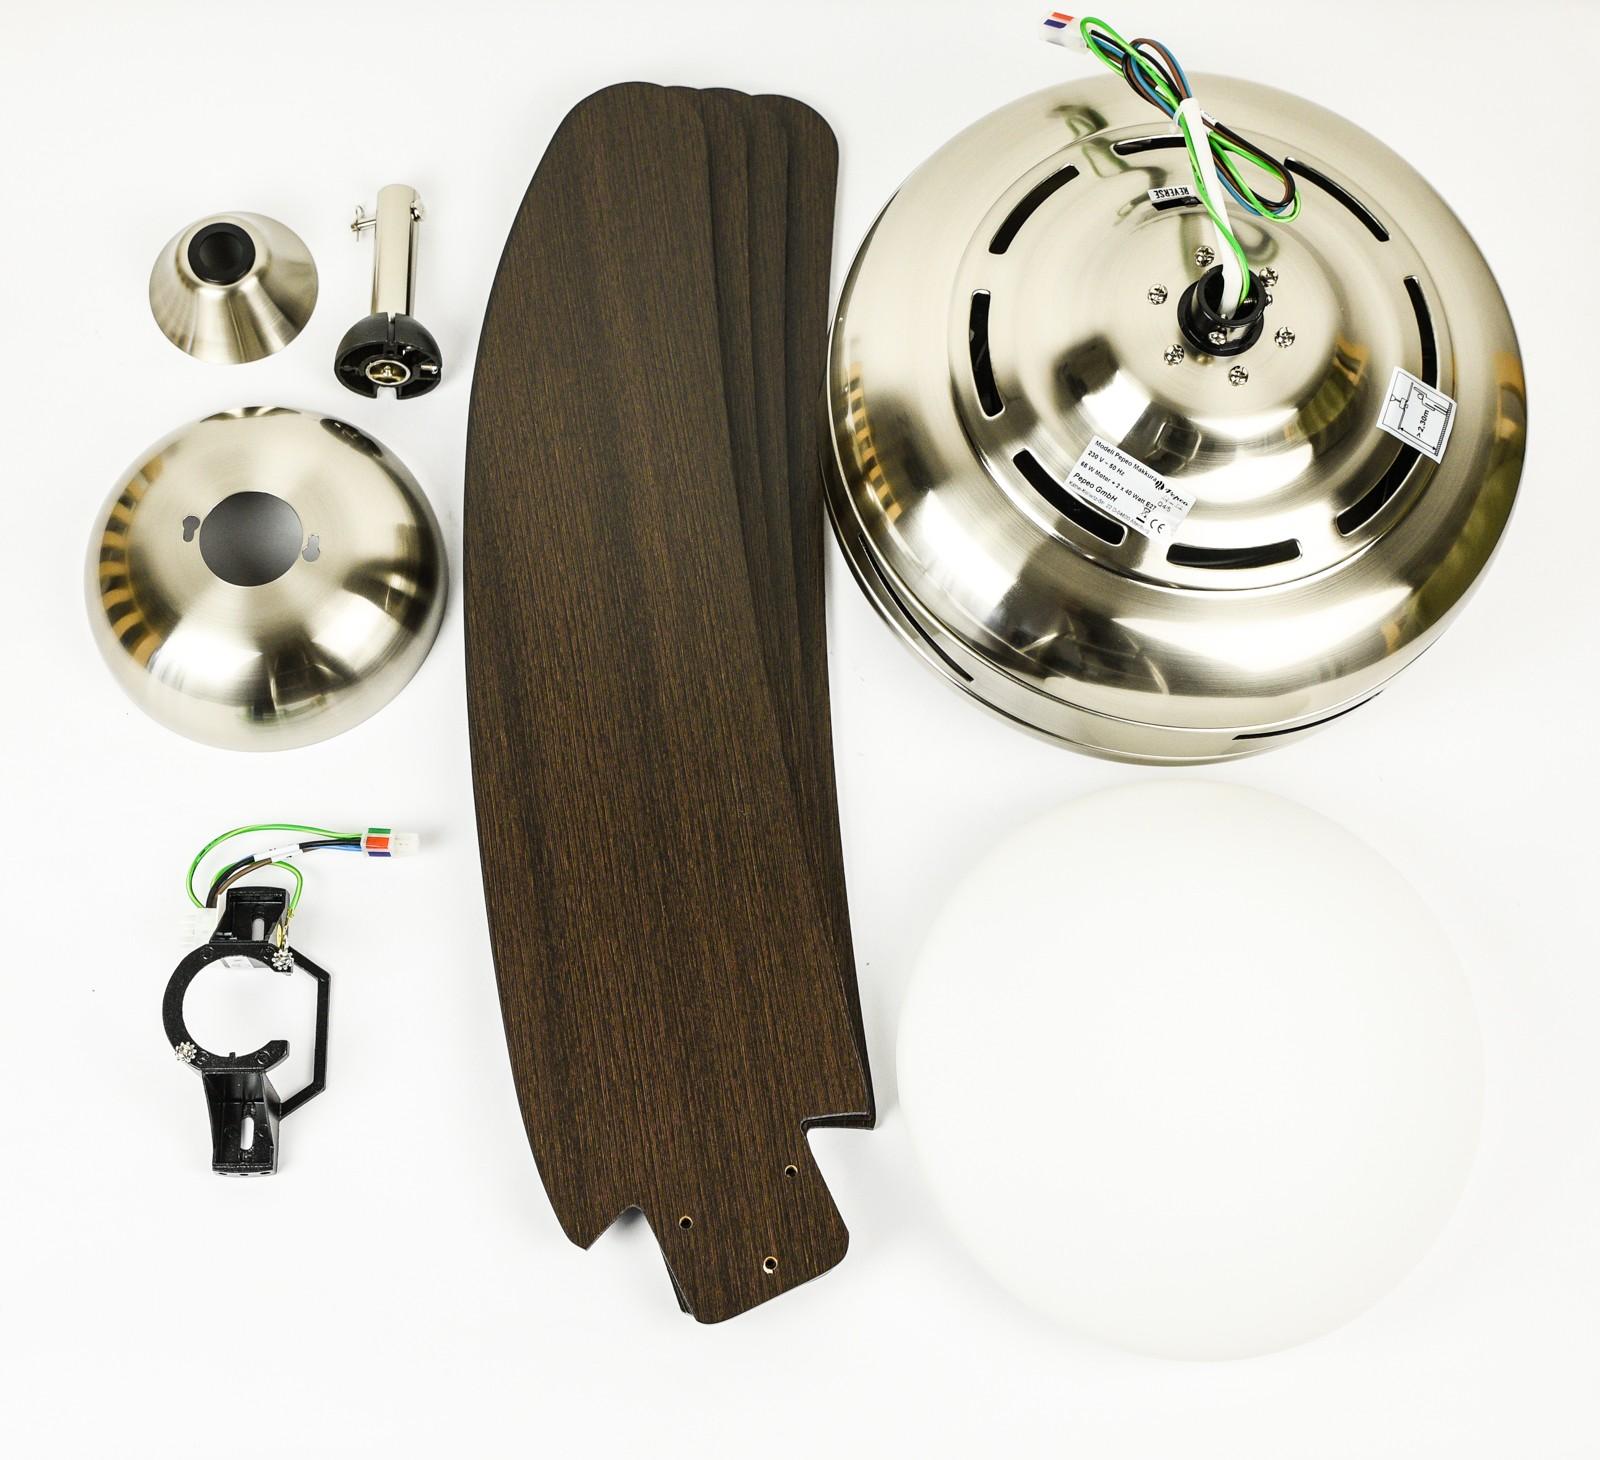 ersatzteile f r pepeo deckenventilator 1320101 makkura pepeo. Black Bedroom Furniture Sets. Home Design Ideas